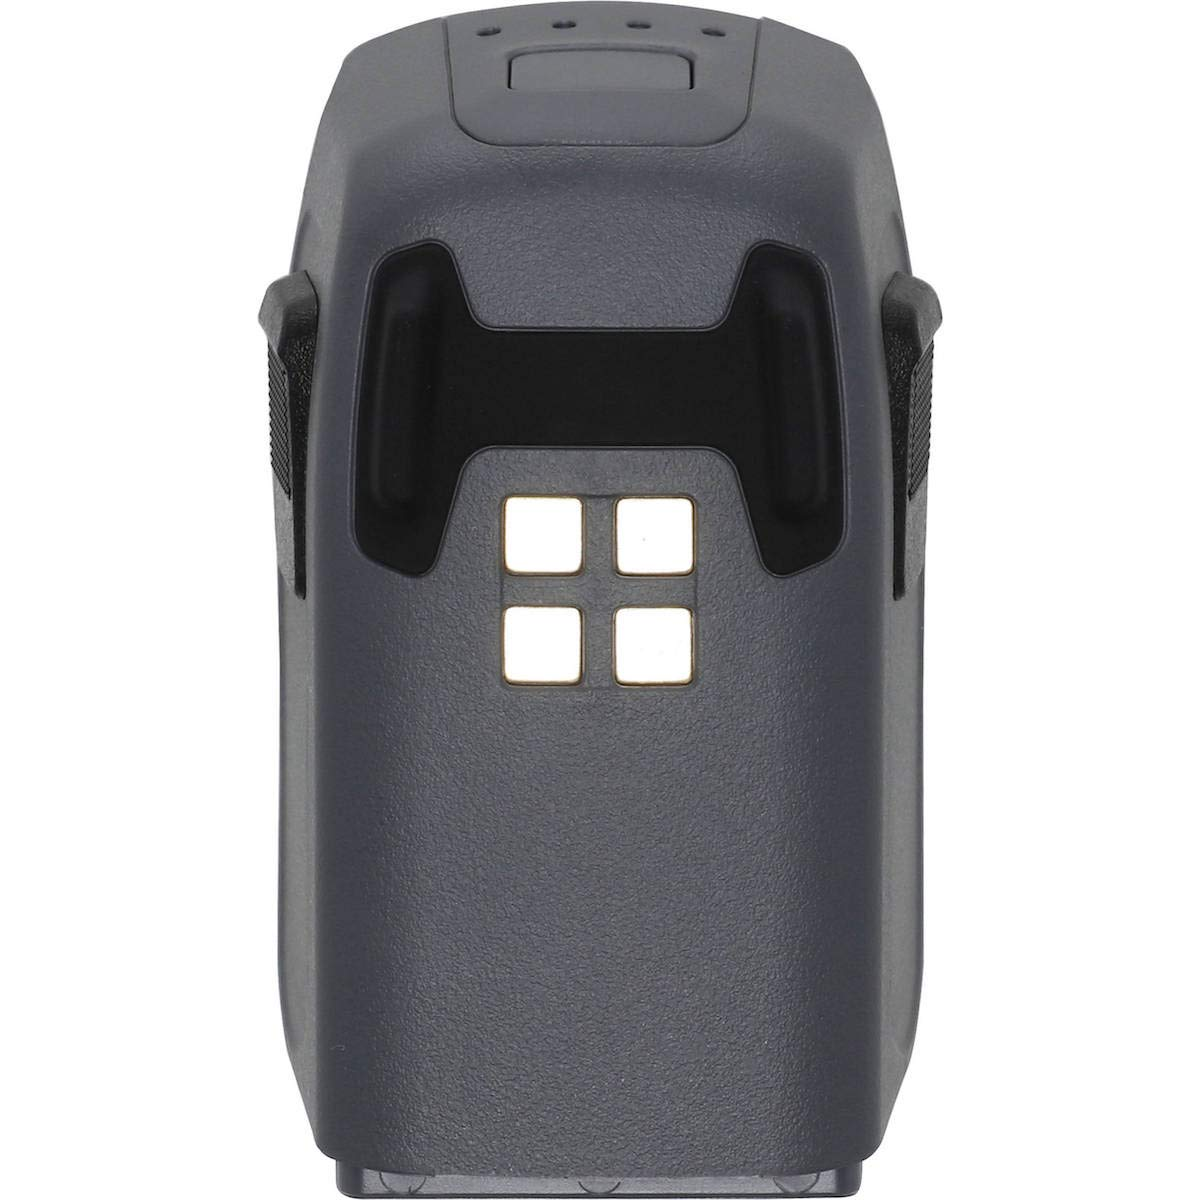 Bateria Drone DJI CP.PT.000789 negra (xsr)